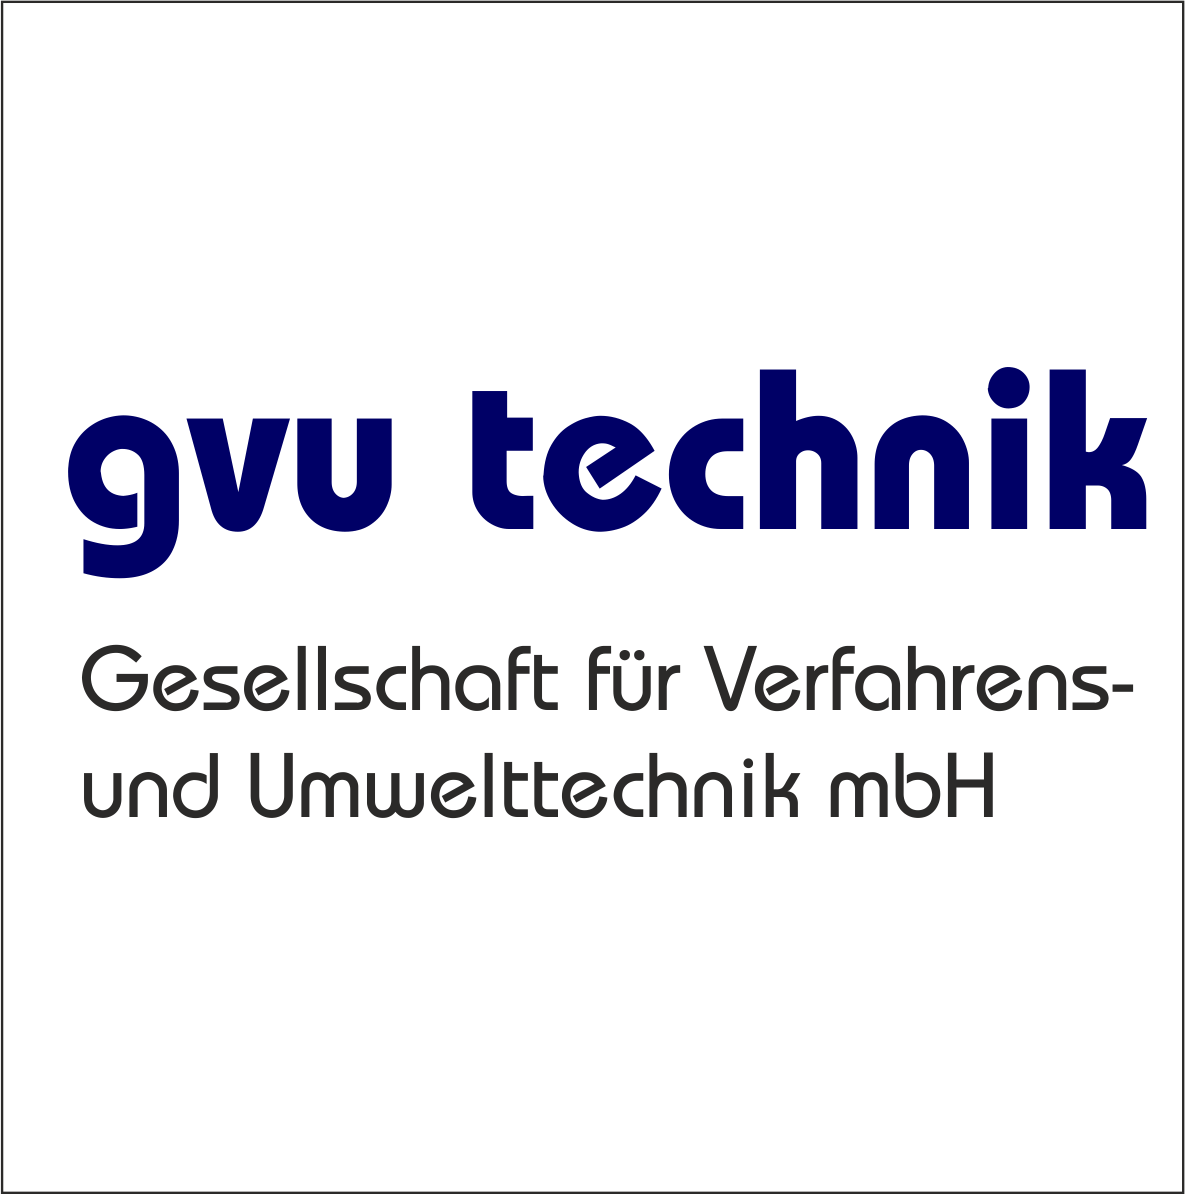 gvu technik 1